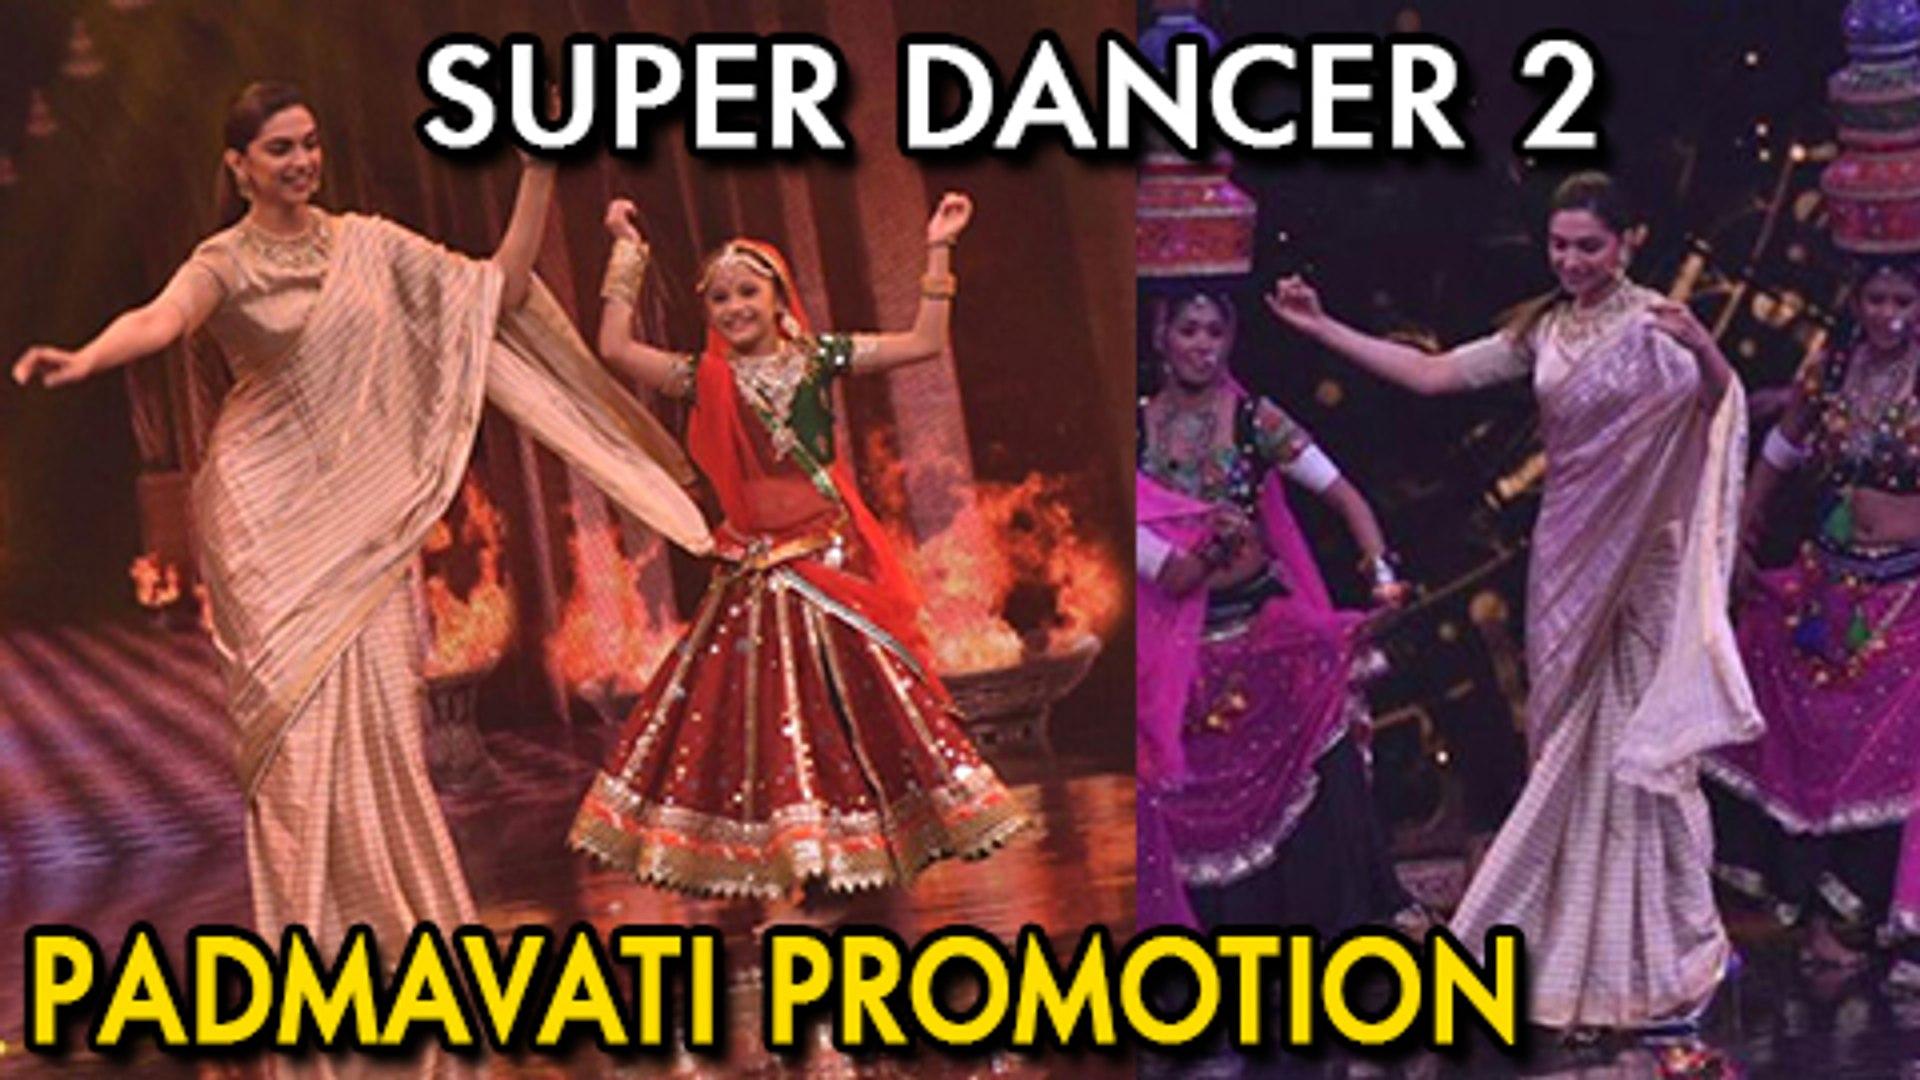 Deepika Padukone Performs Ghoomar On Super Dancer 2 | Padmavati Promotions